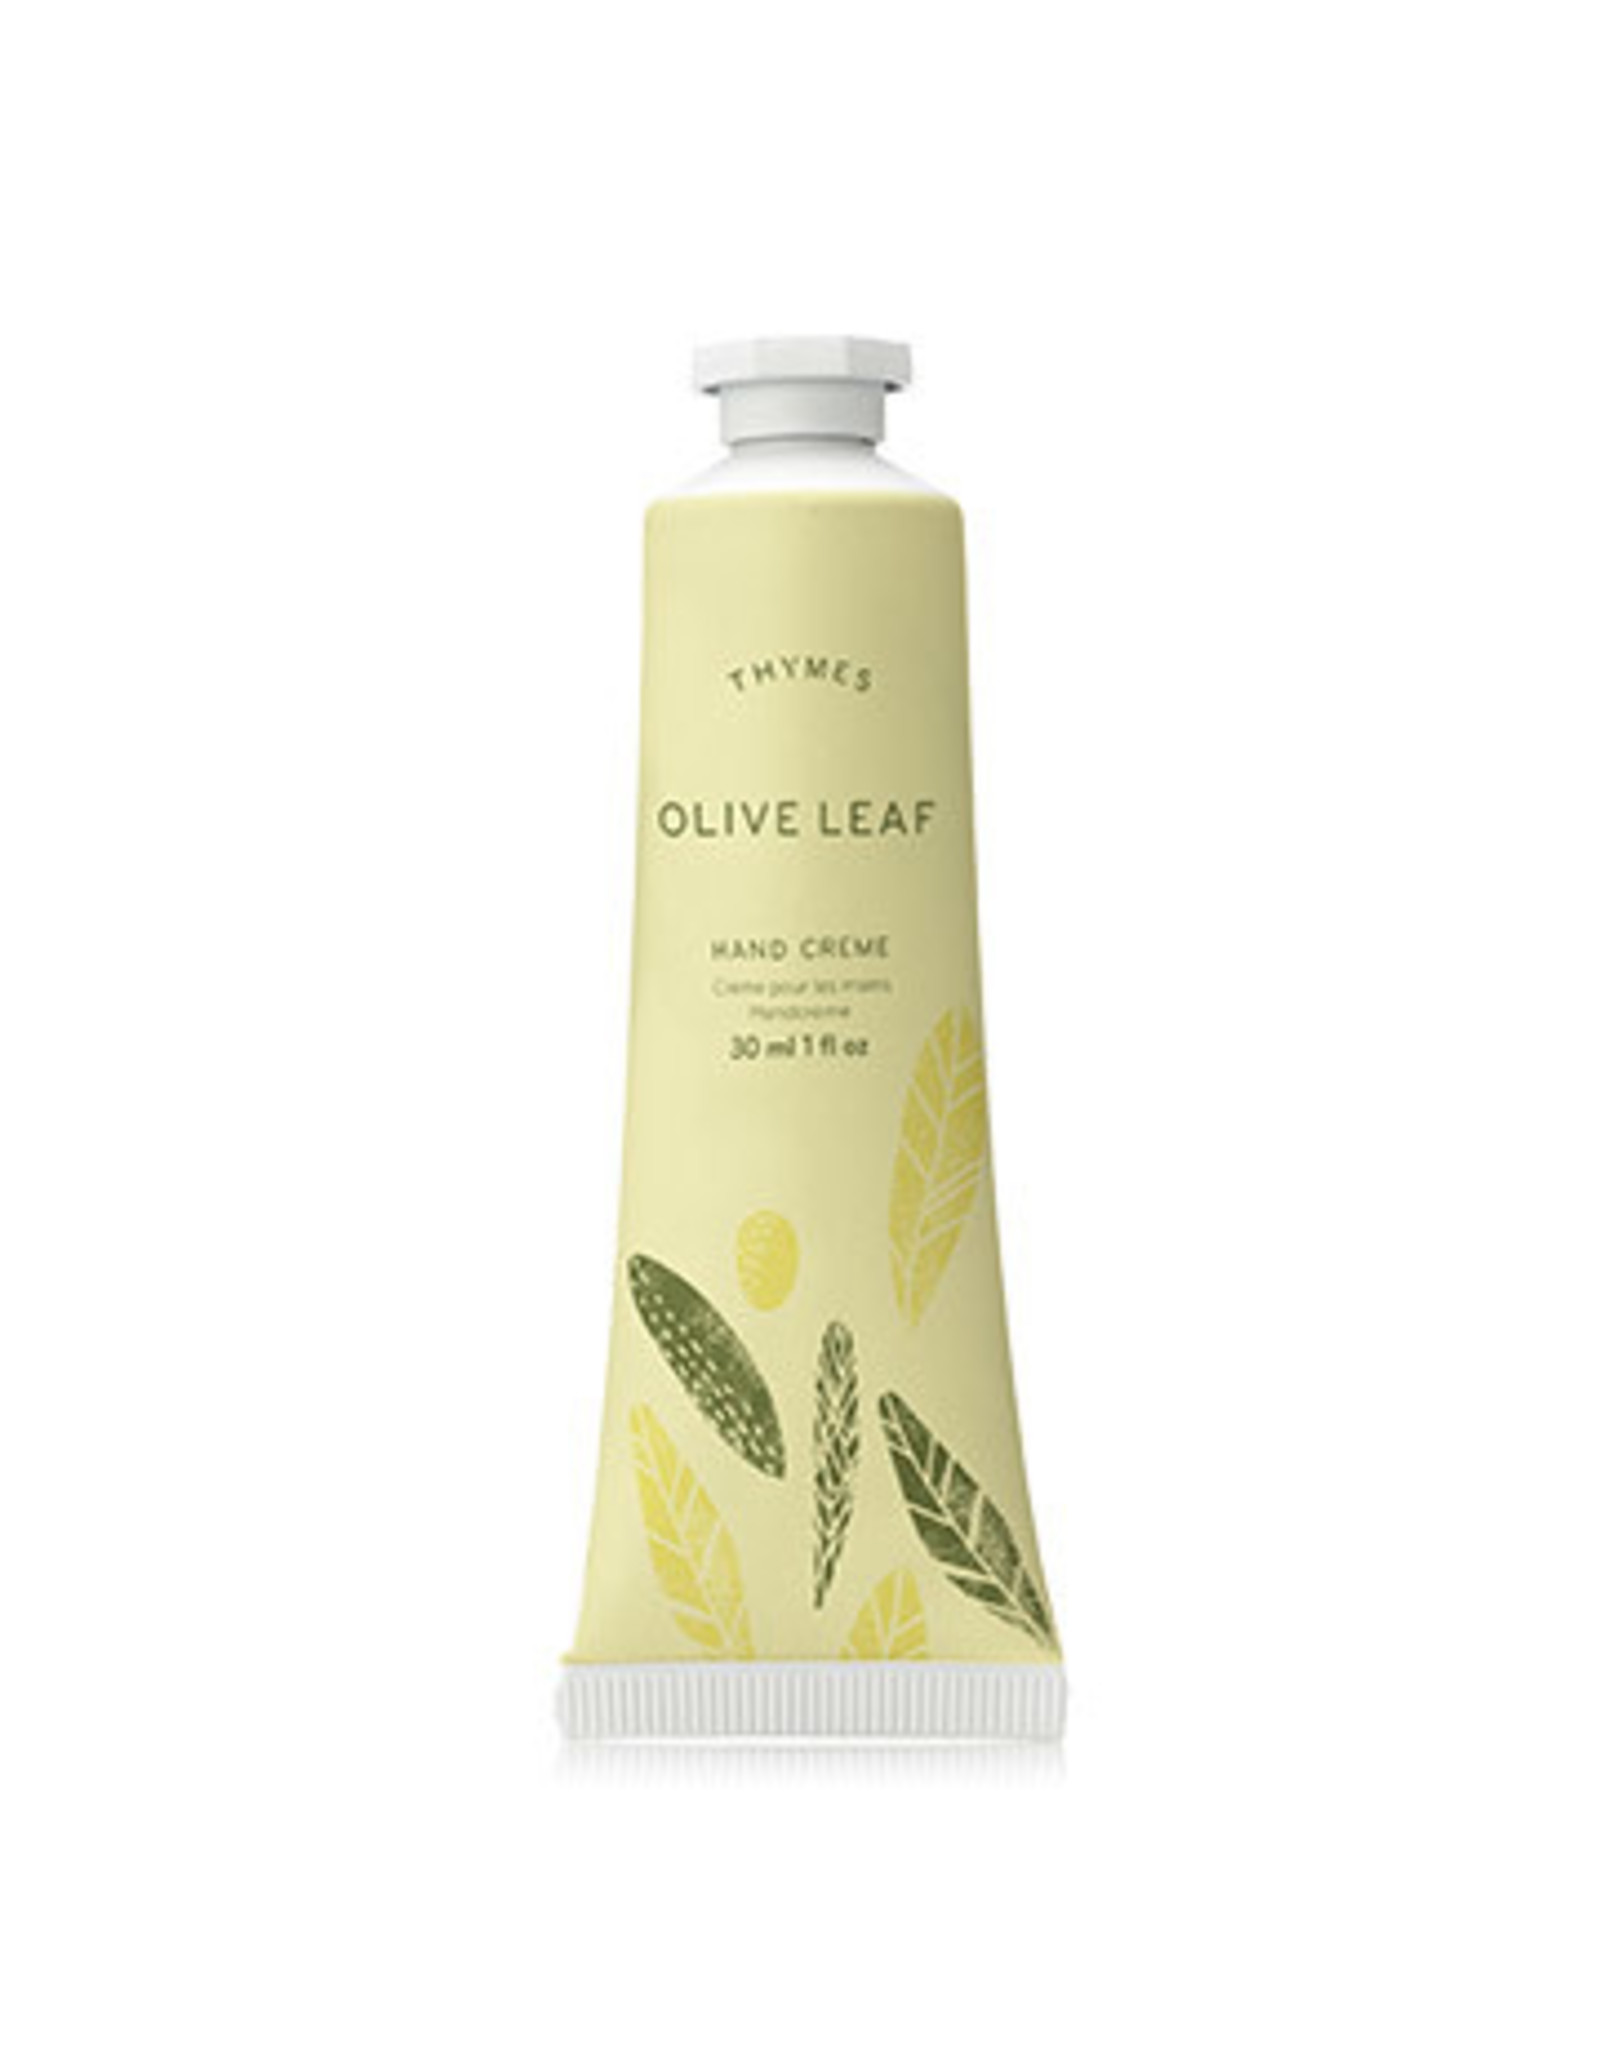 Thymes Olive Leaf Petite Hand Creme